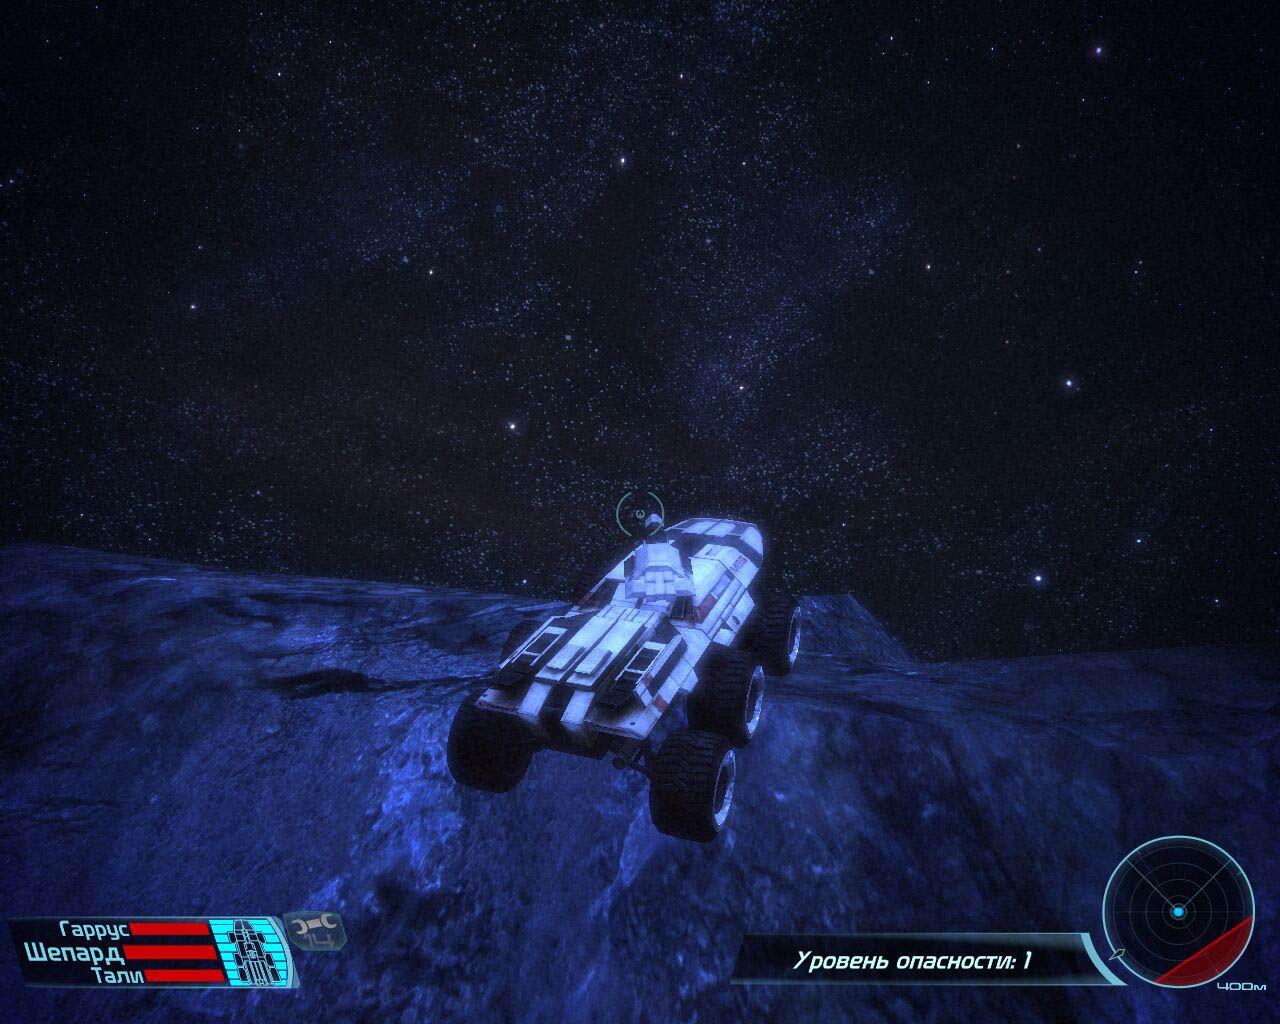 Мако - Moonwalker - Скриншоты Mass Effect 1